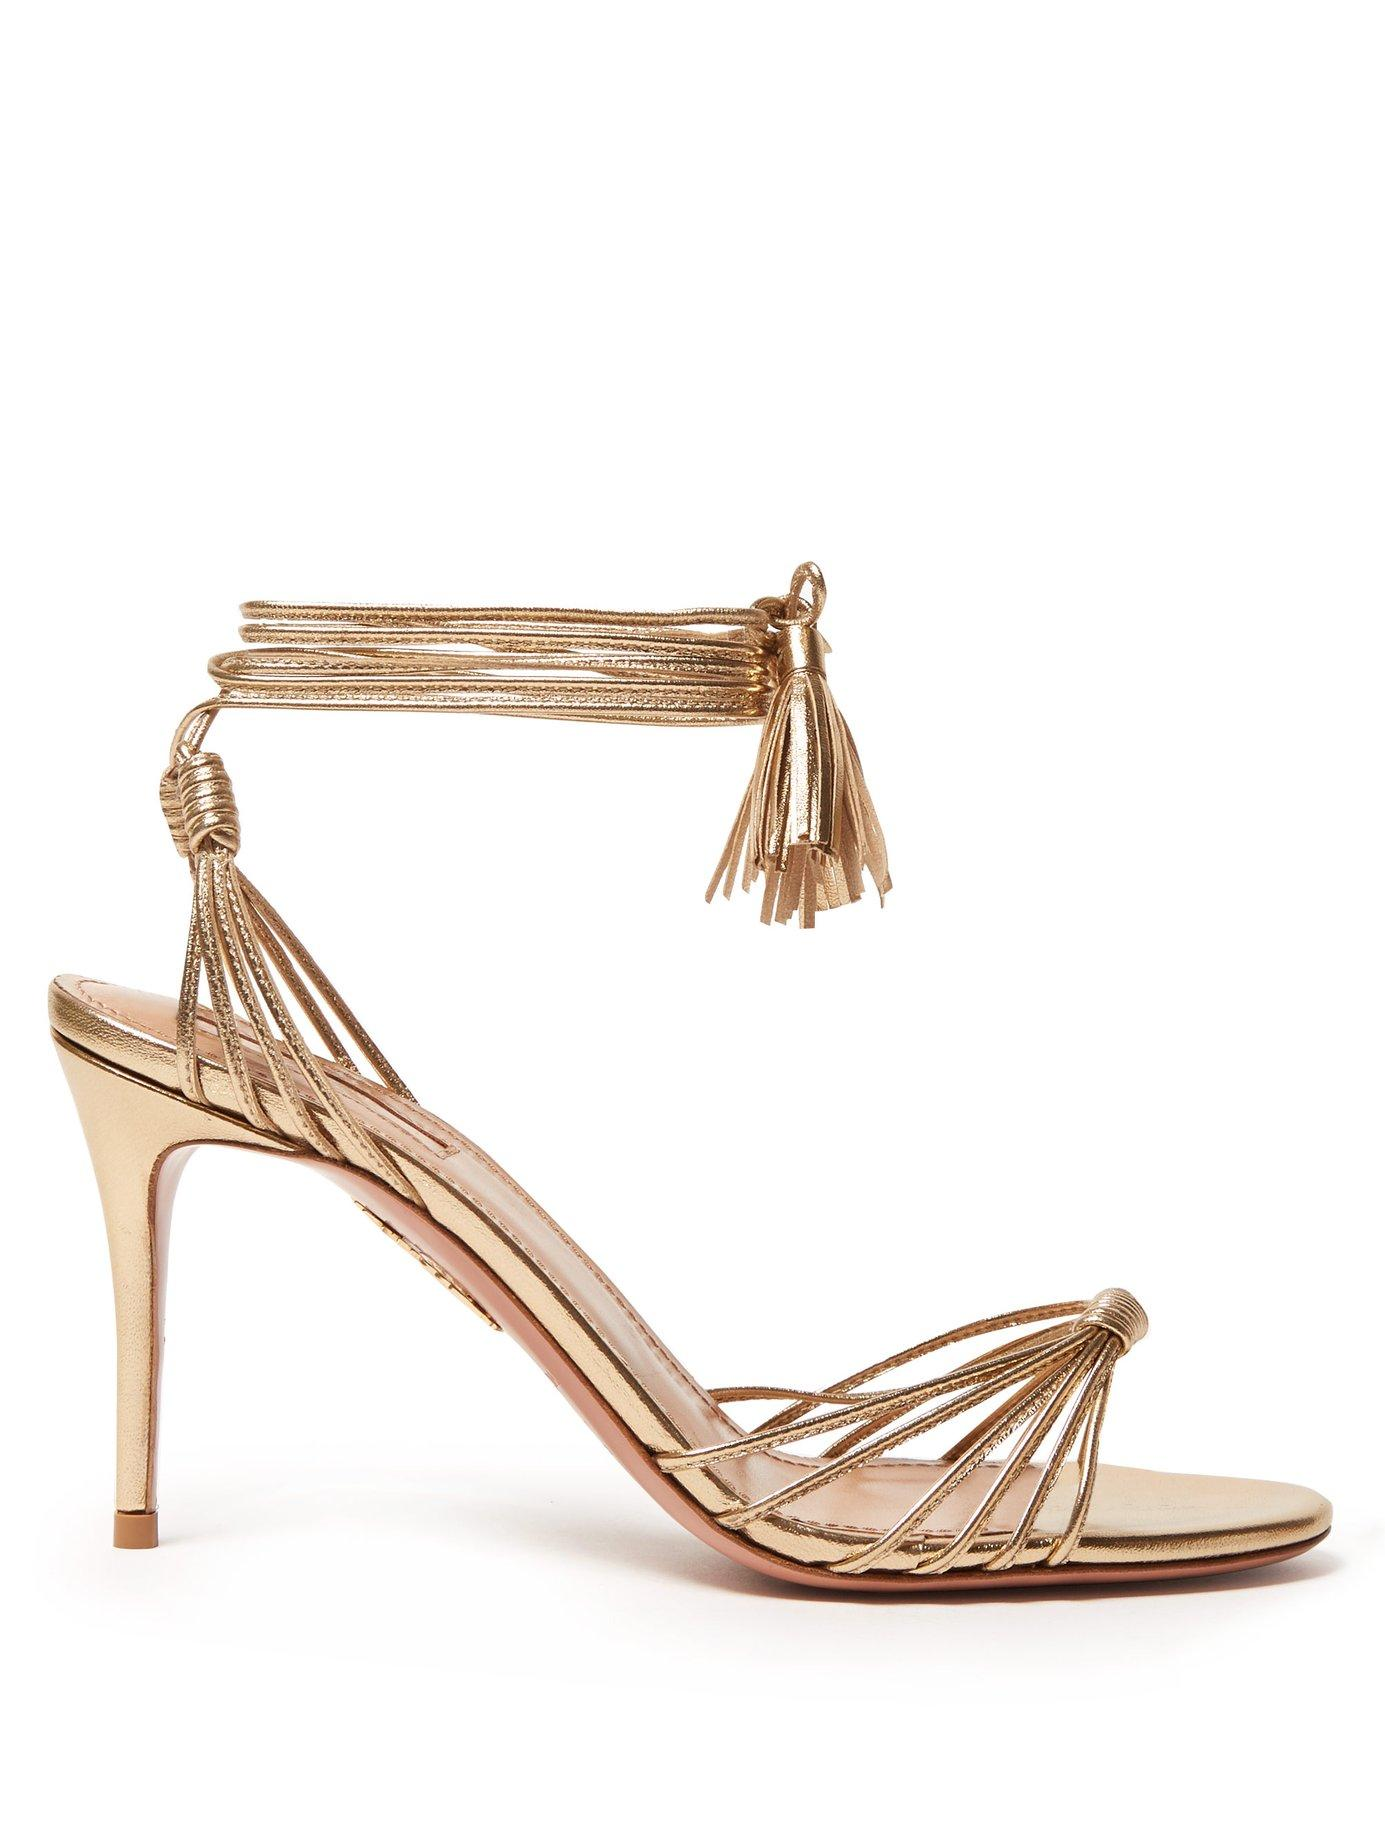 541849171b7 Lyst - Aquazzura Mescal 85 Metallic Wrap Around Leather Sandals in ...